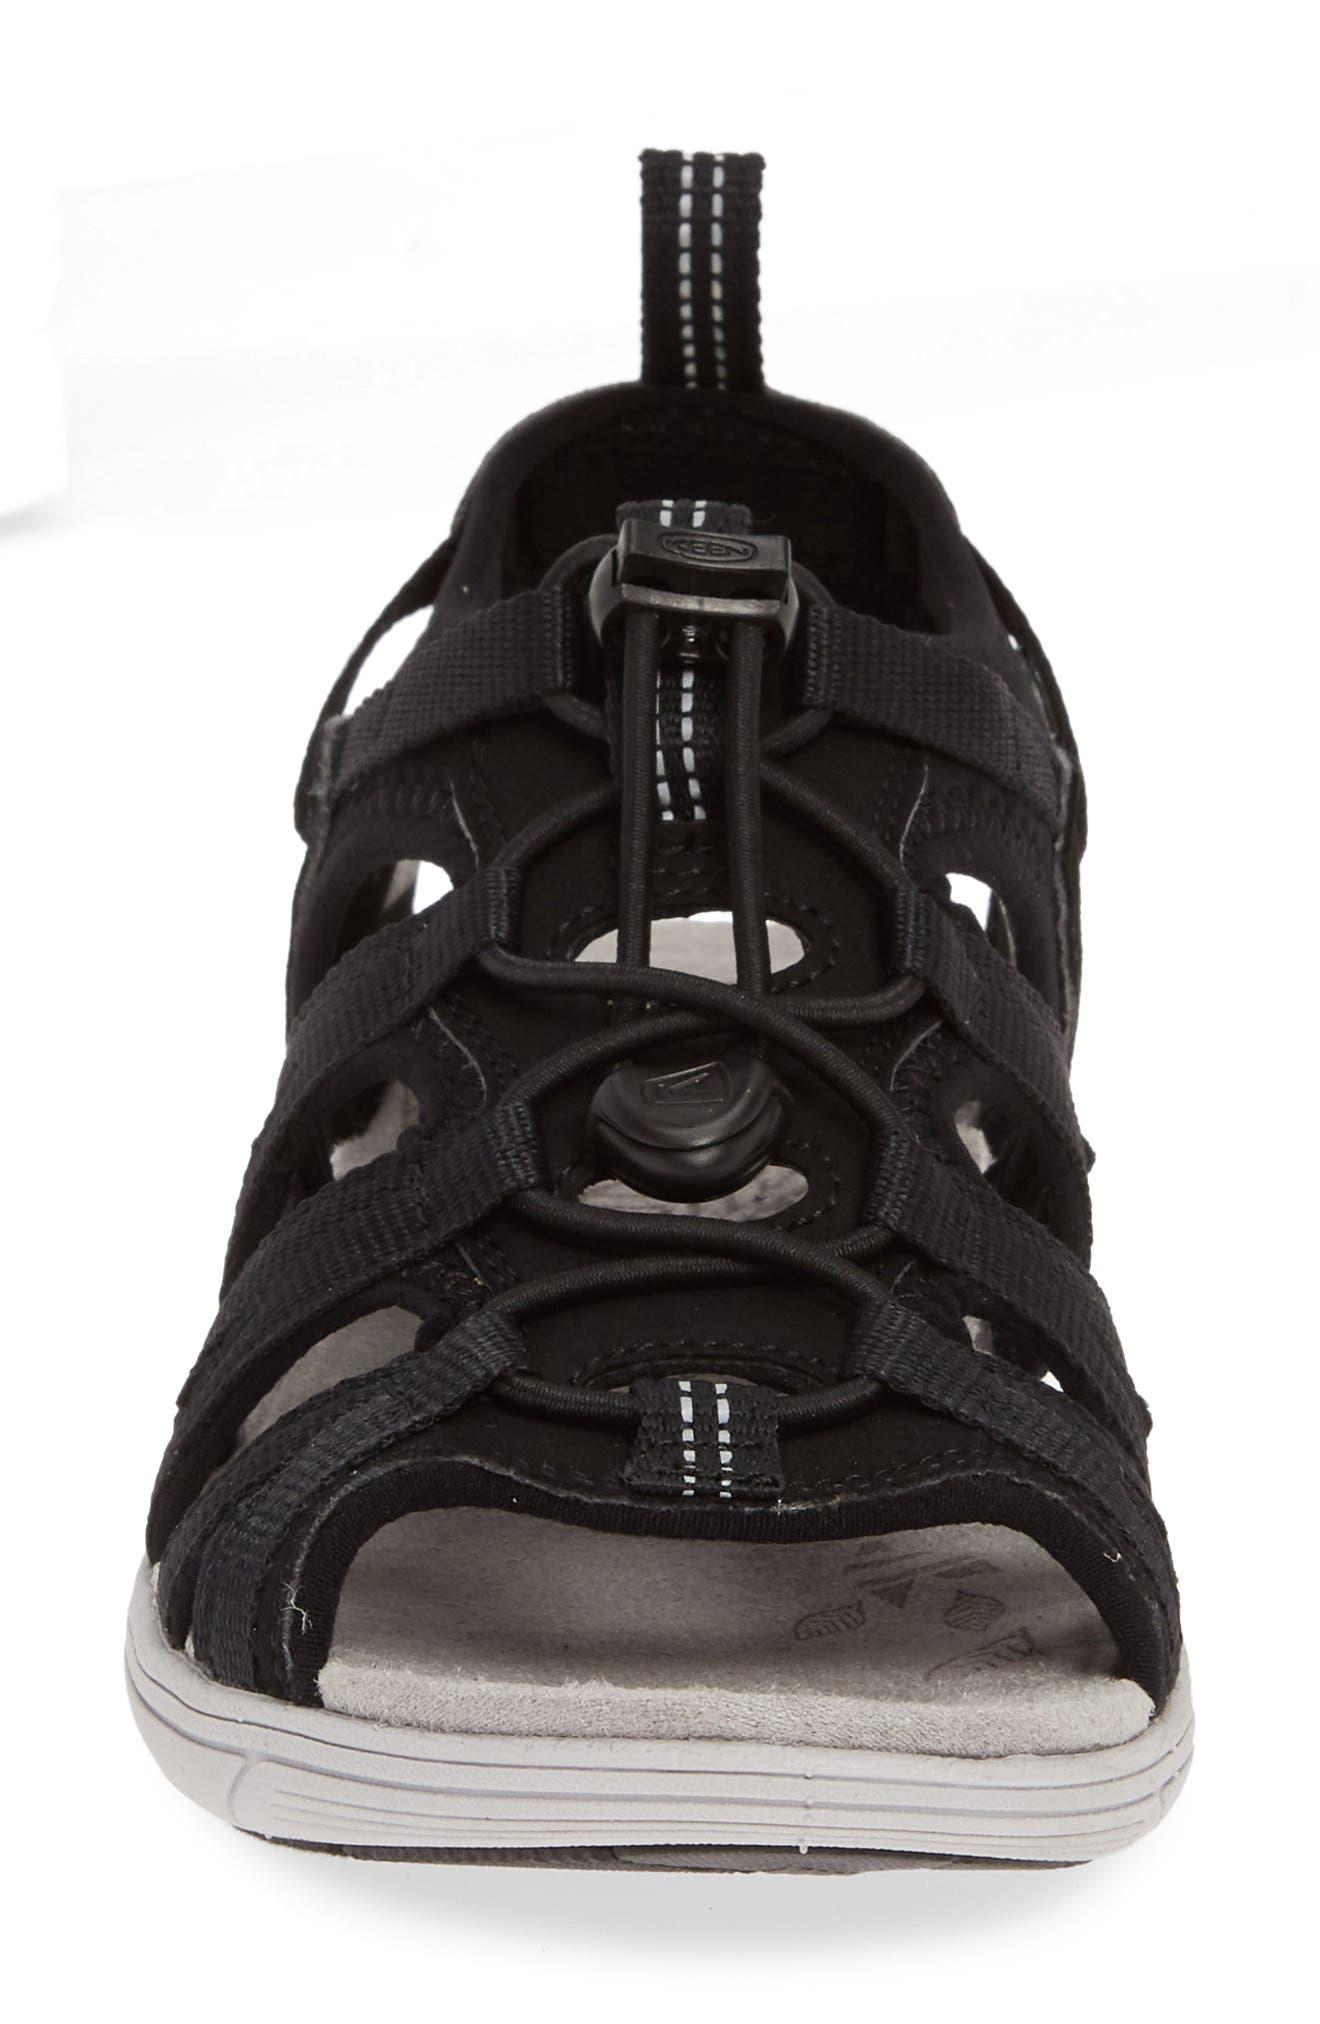 KEEN, Damaya Lattice Sandal, Alternate thumbnail 4, color, BLACK/ VAPOR FABRIC